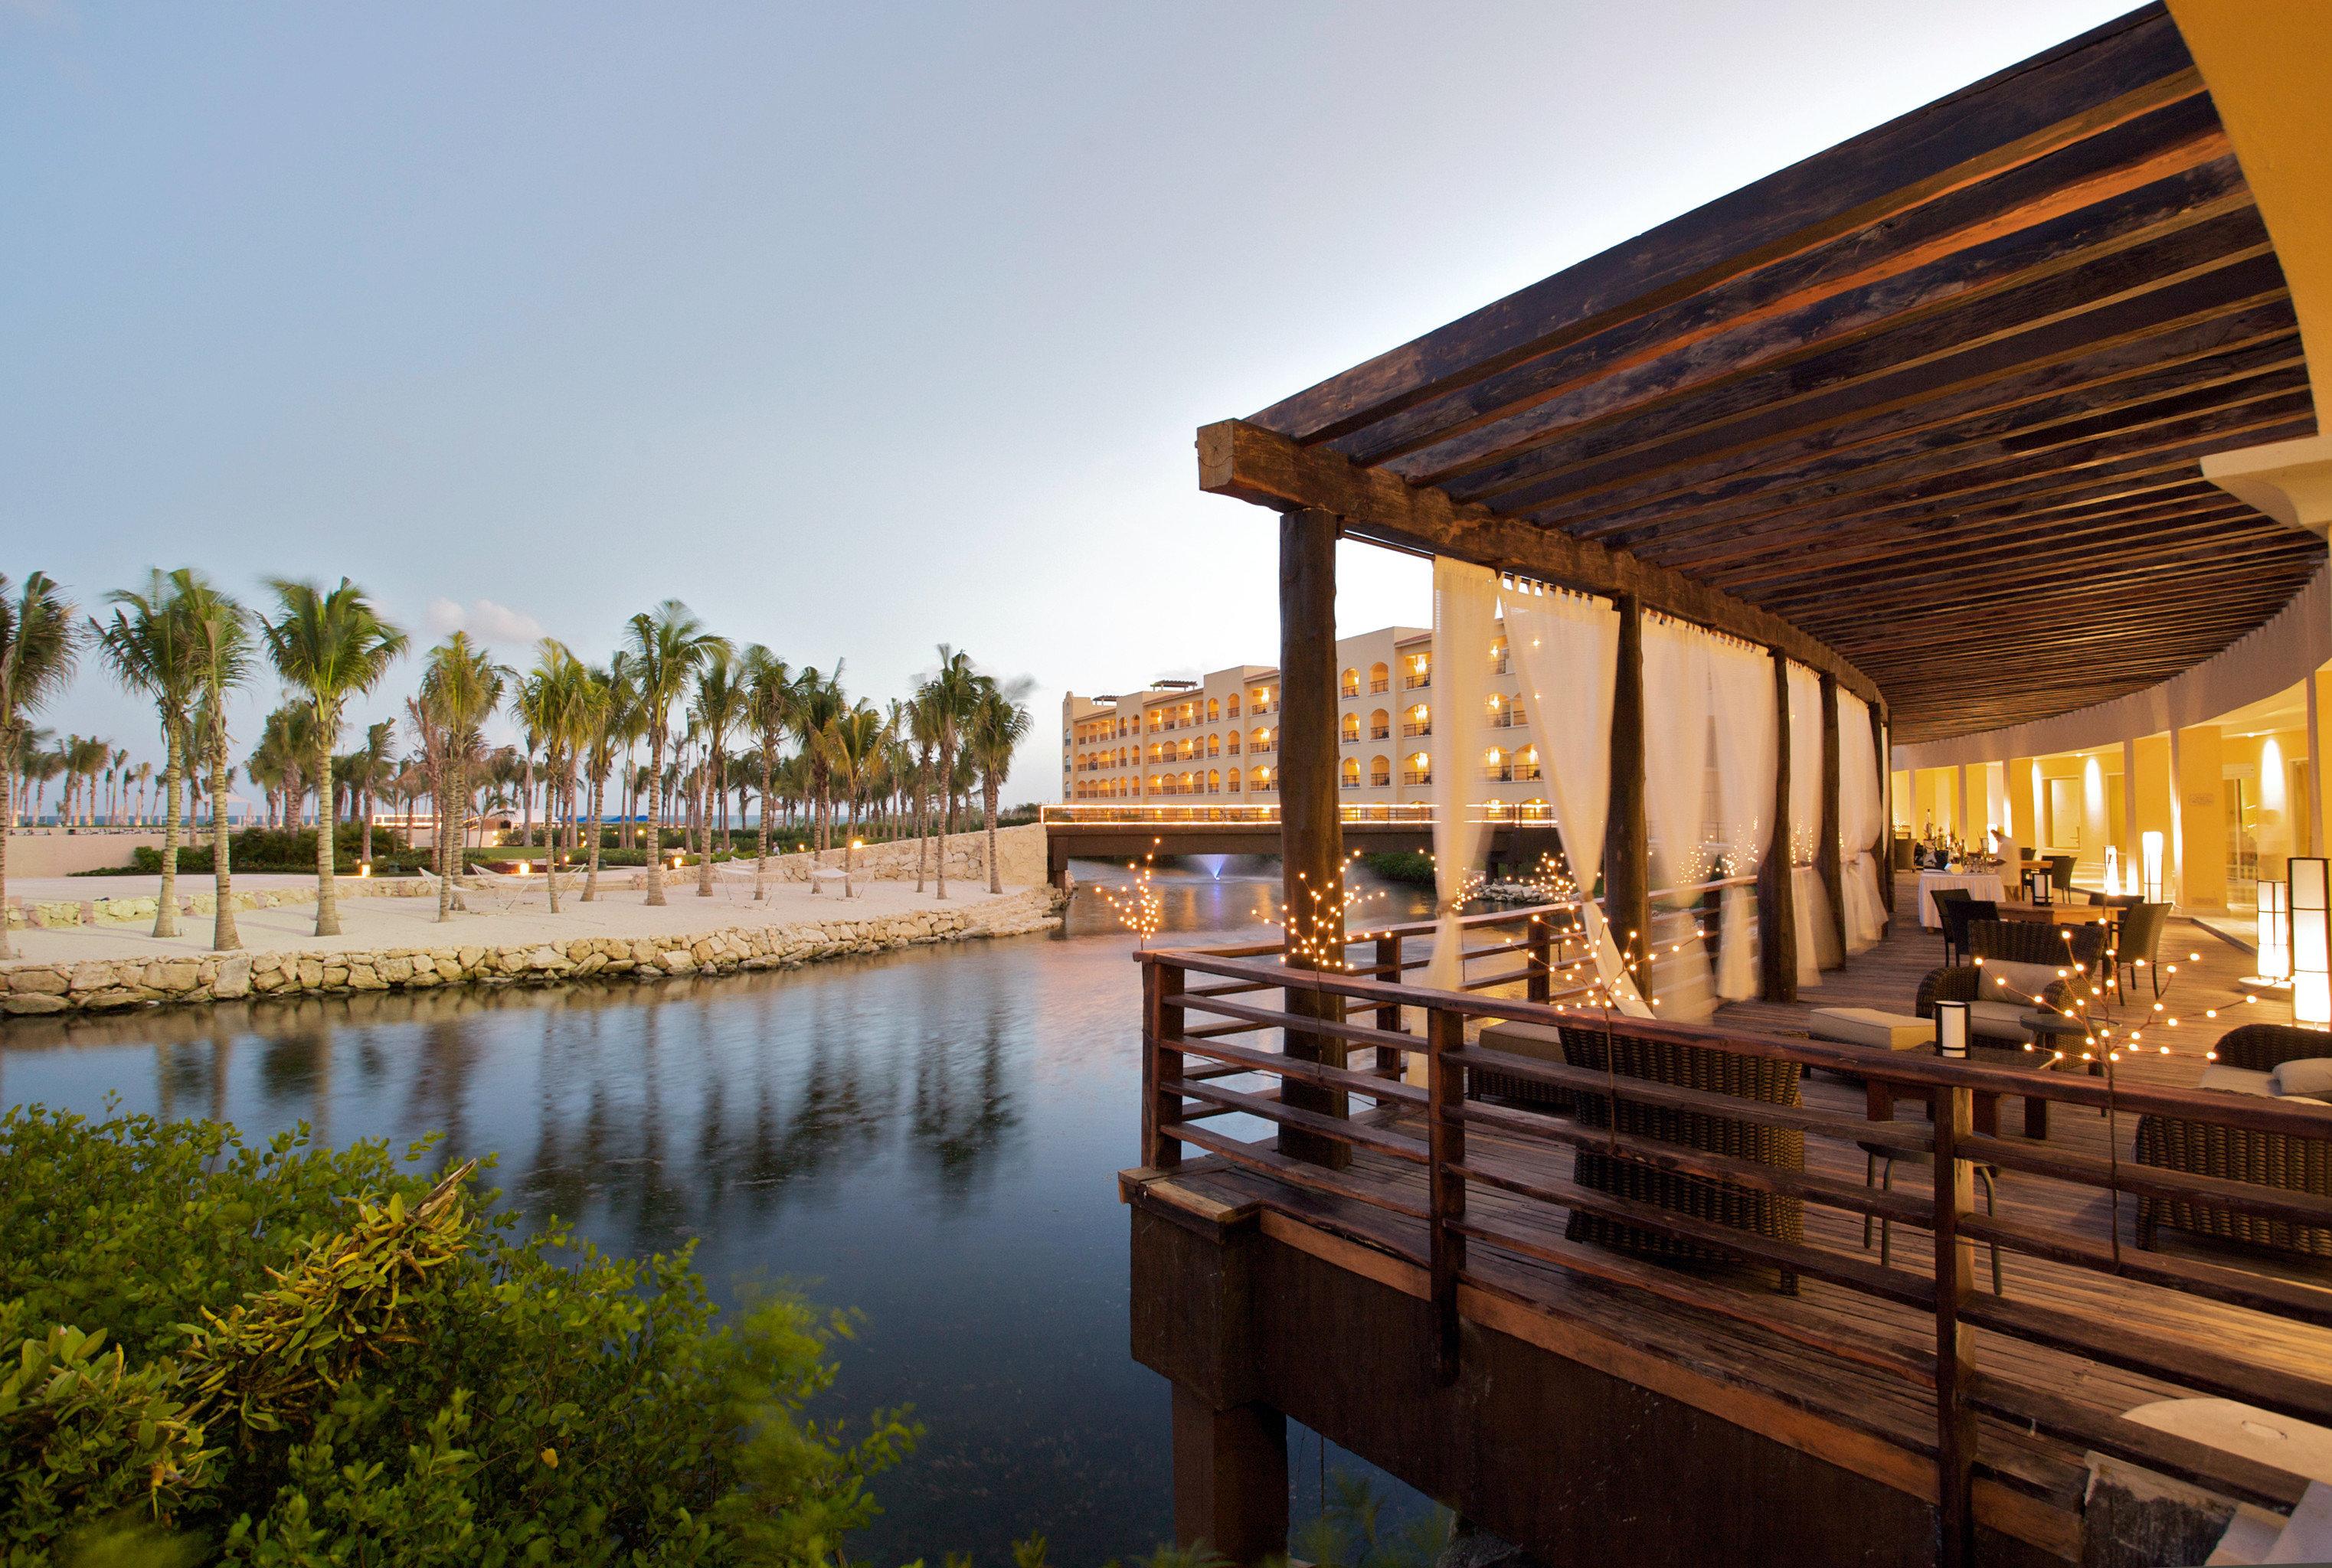 Beachfront Lounge Luxury Modern Pool sky water Architecture Resort